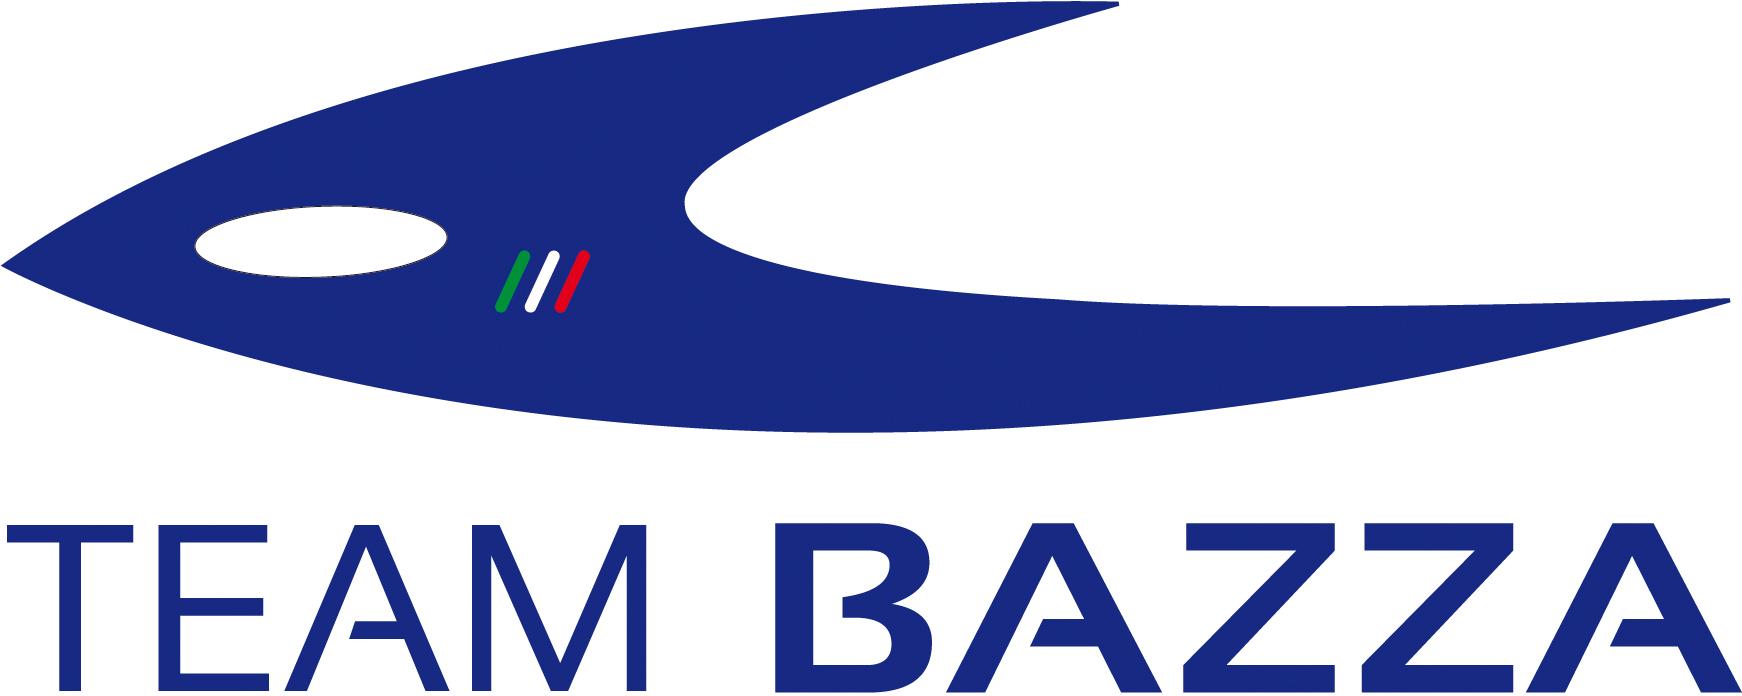 logo BAZZA blu ok